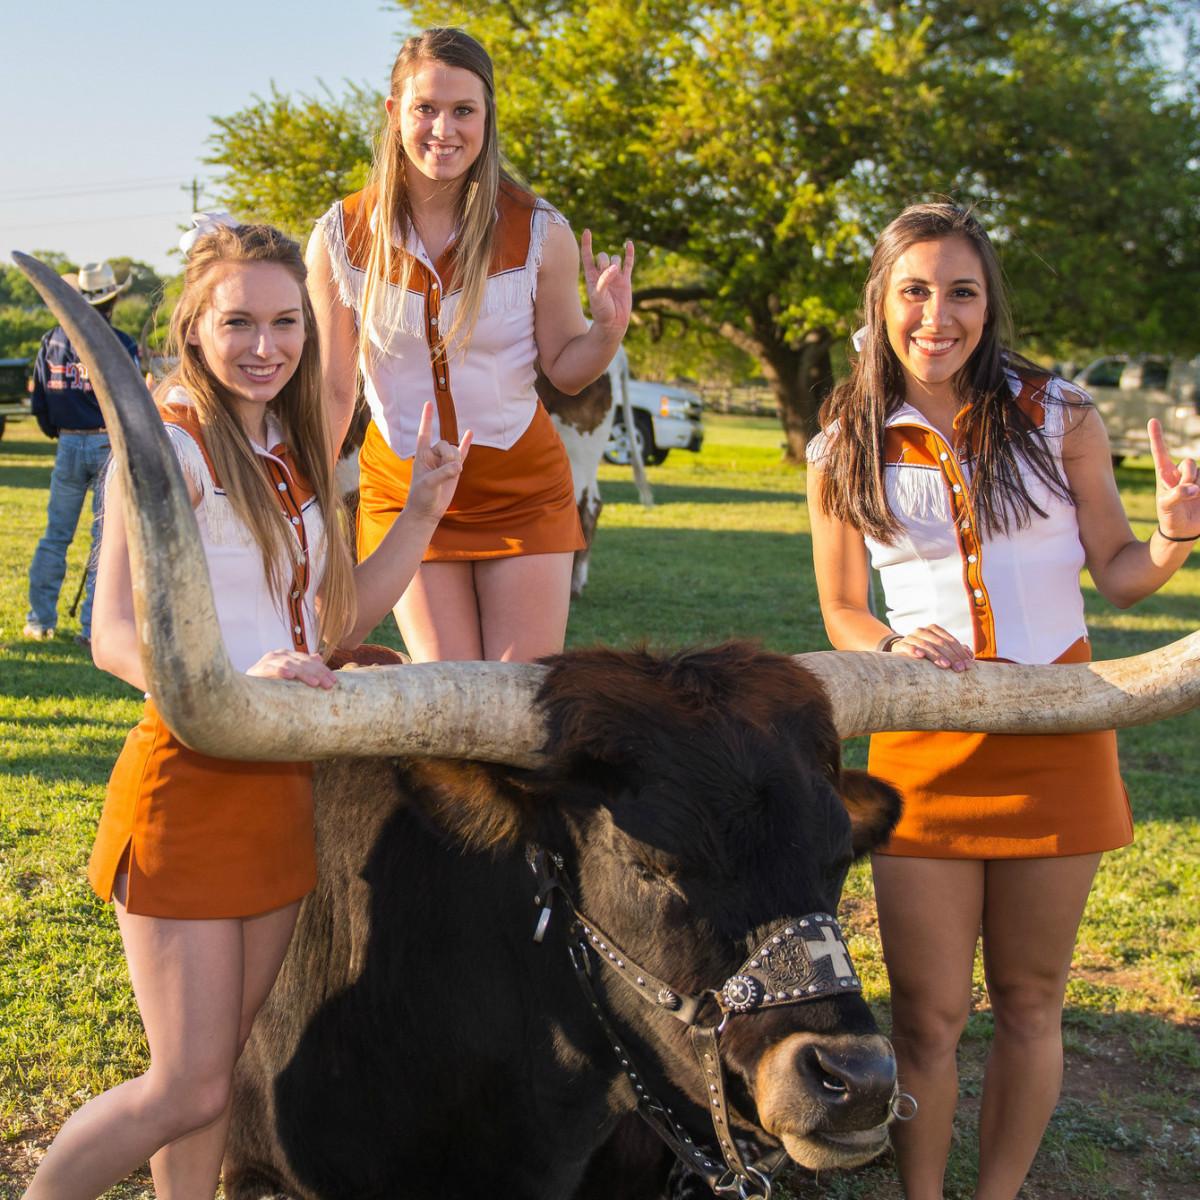 Bandana Ball April 2016 Ronald McDonald House Charities of Central Texas University of Texas cheerleaders longhorn